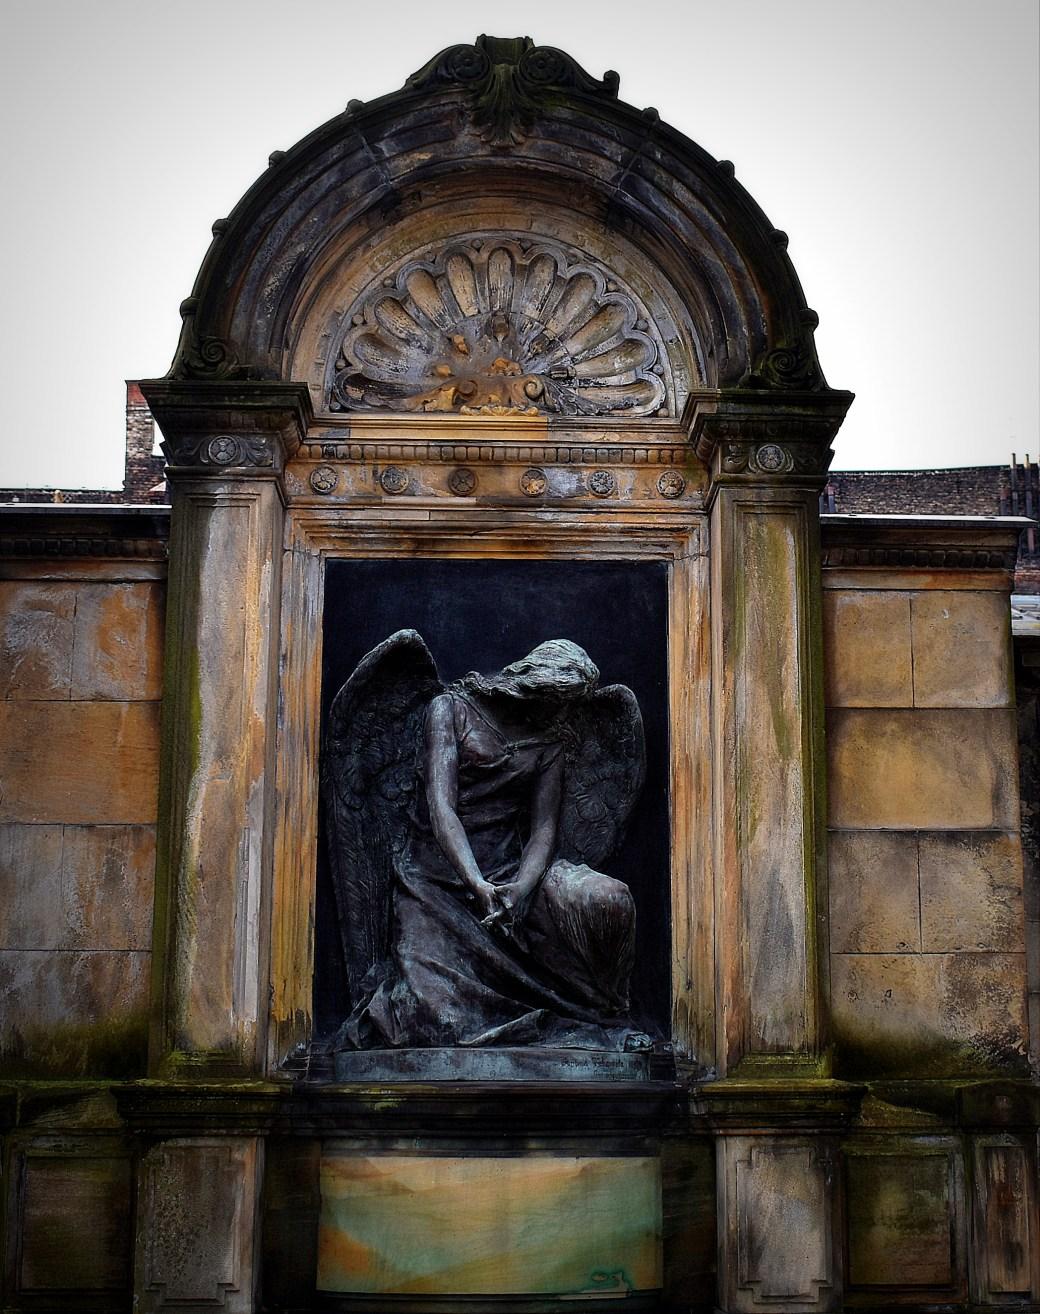 Trauernder Engel